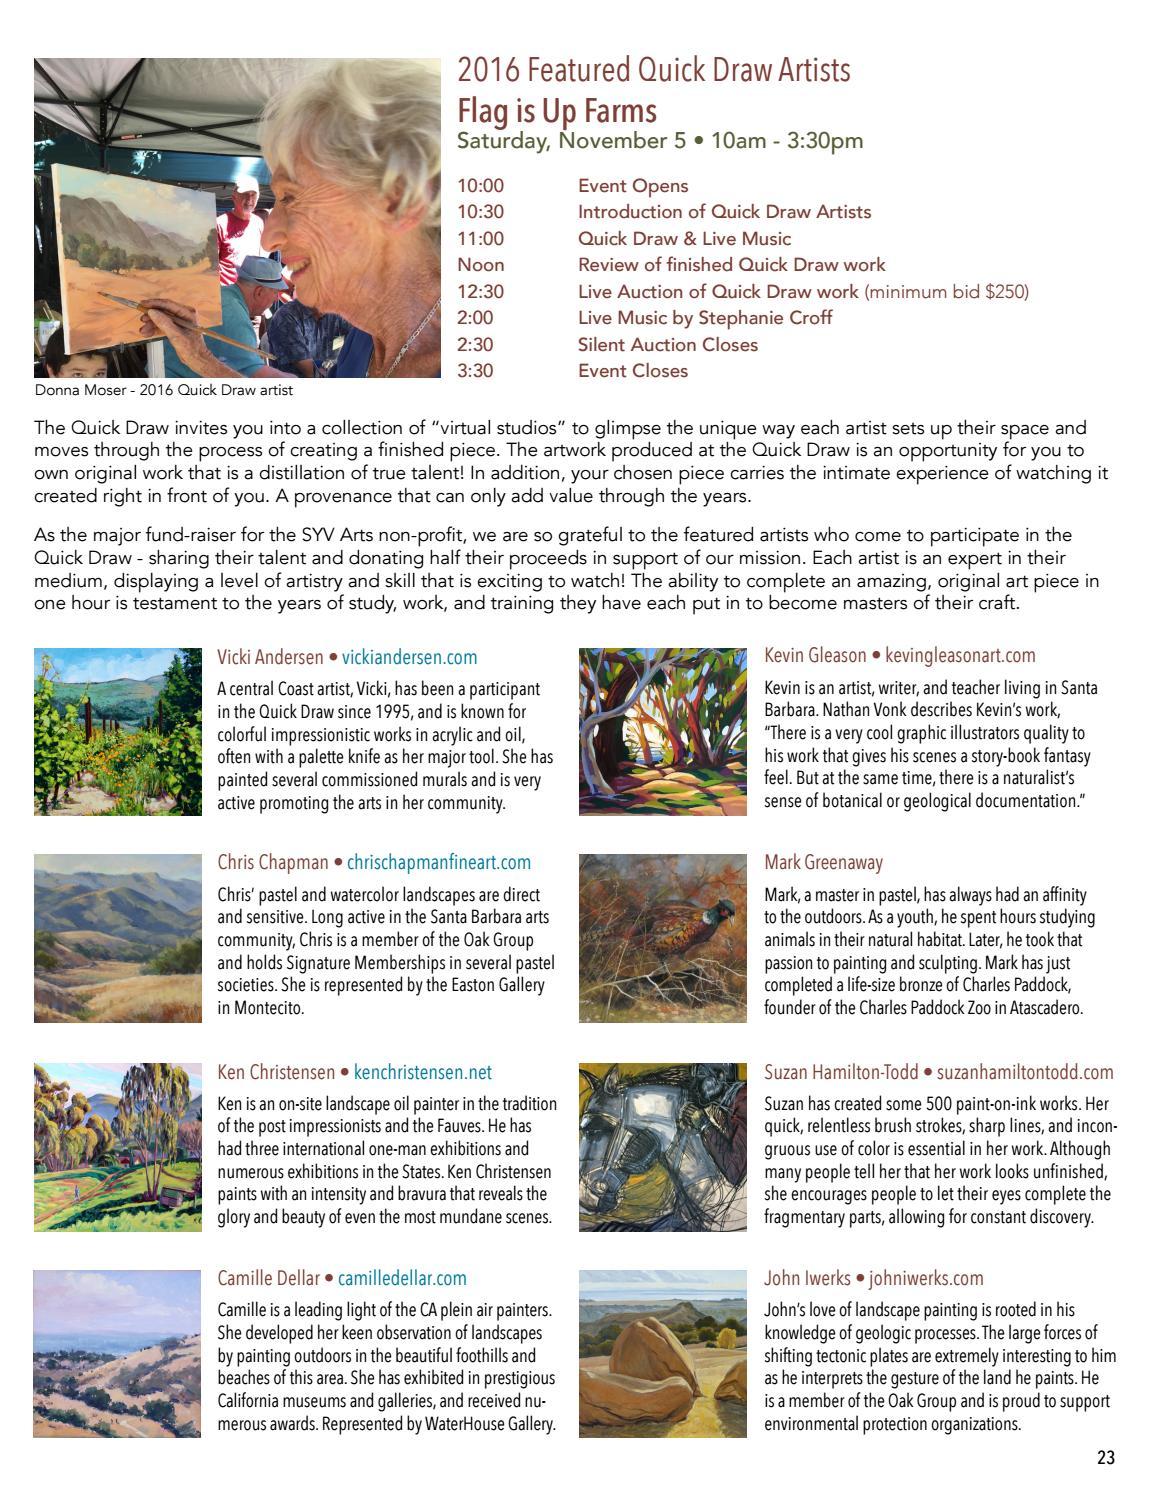 July 2016 SYV Arts Digital Magazine by Lompoc Valley Art Association